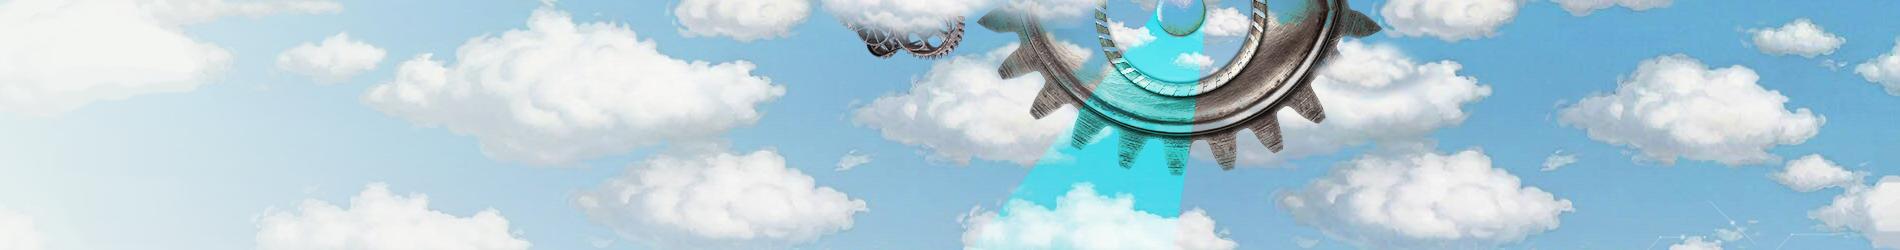 cspm-landing_page-1